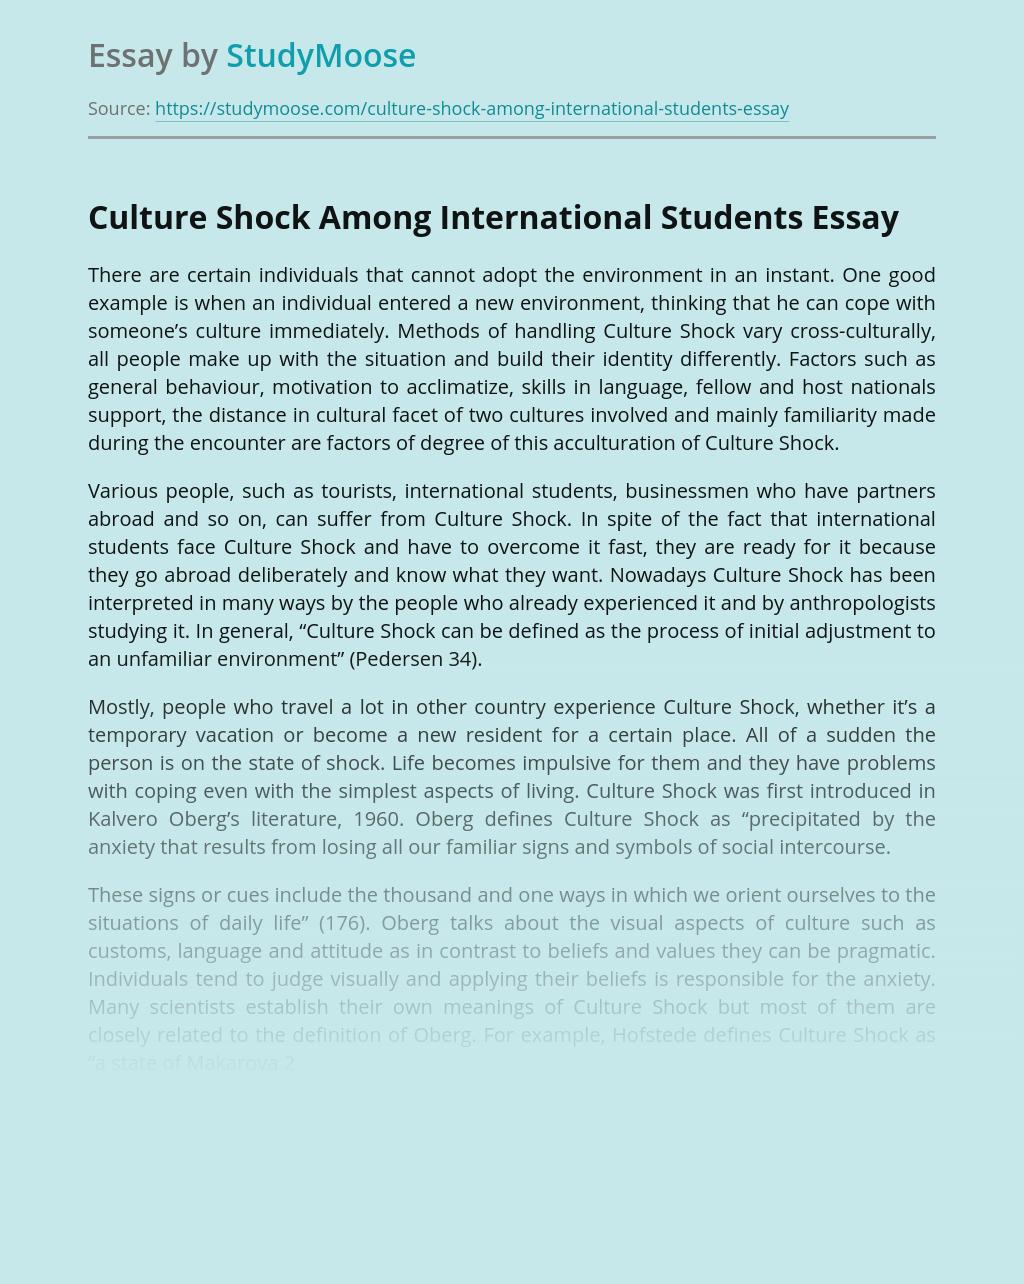 Culture Shock Among International Students